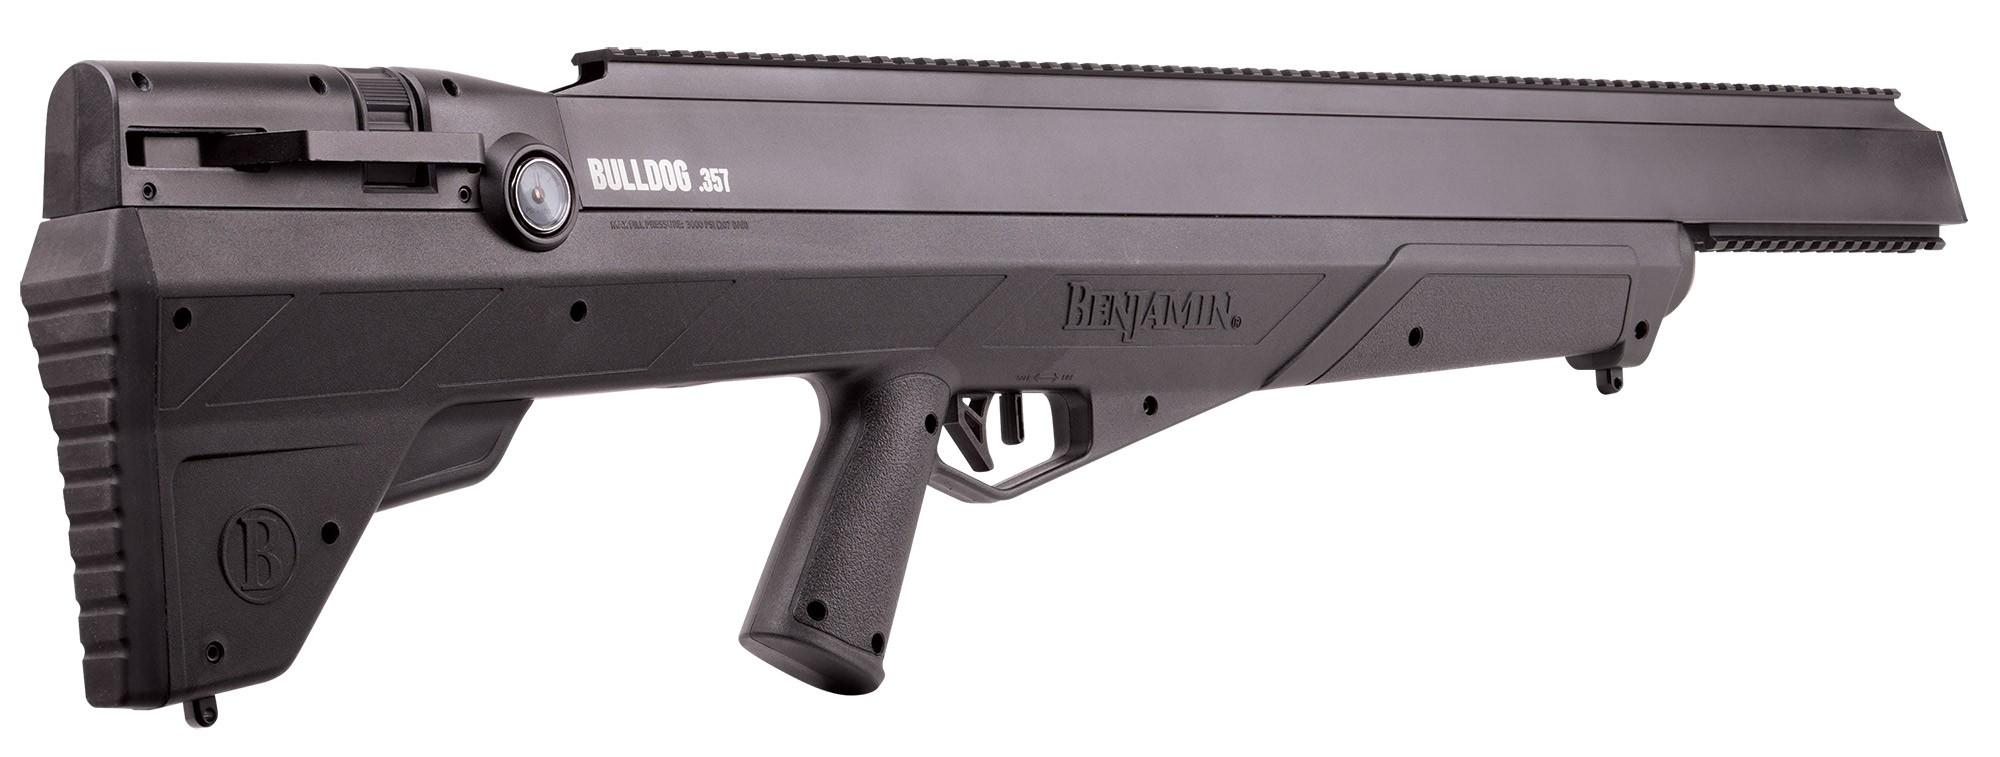 Crosman 357 Pellet Gun